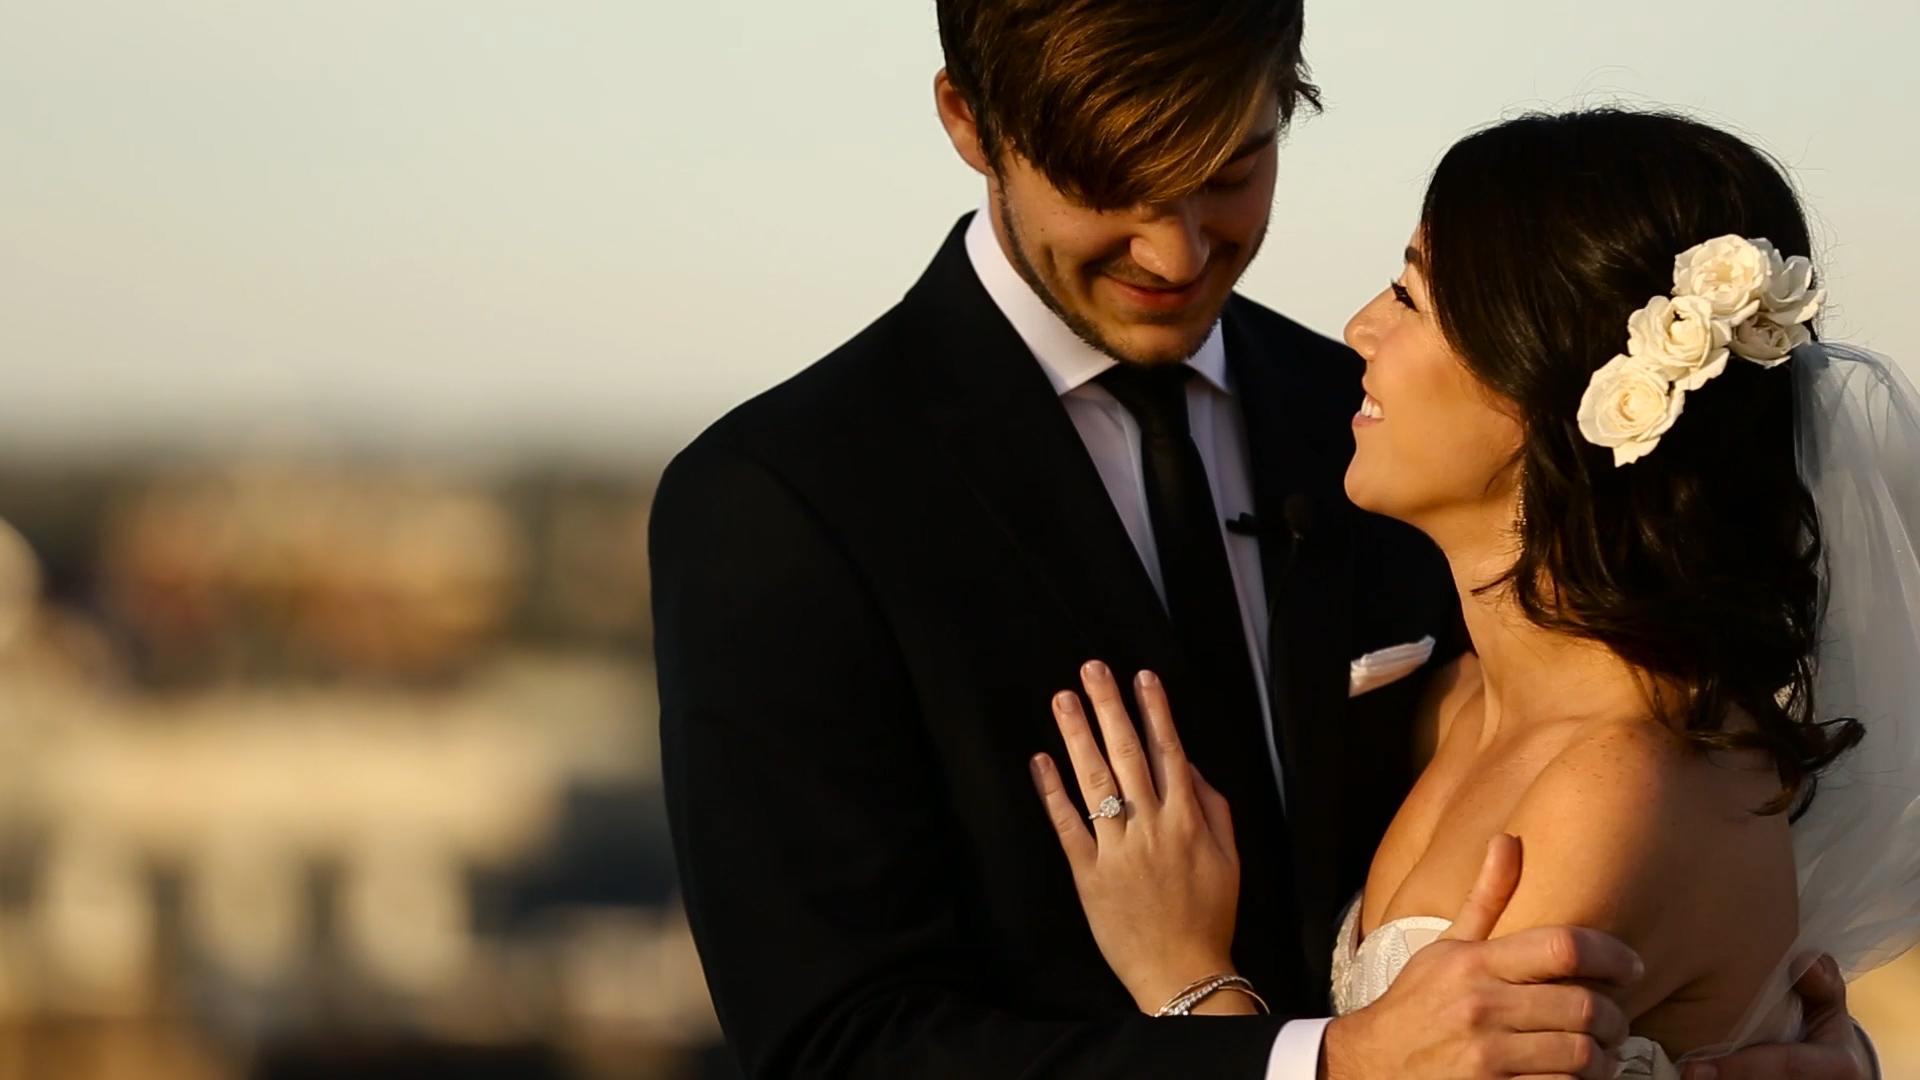 Watch Laura and John's Bride Film  HERE .